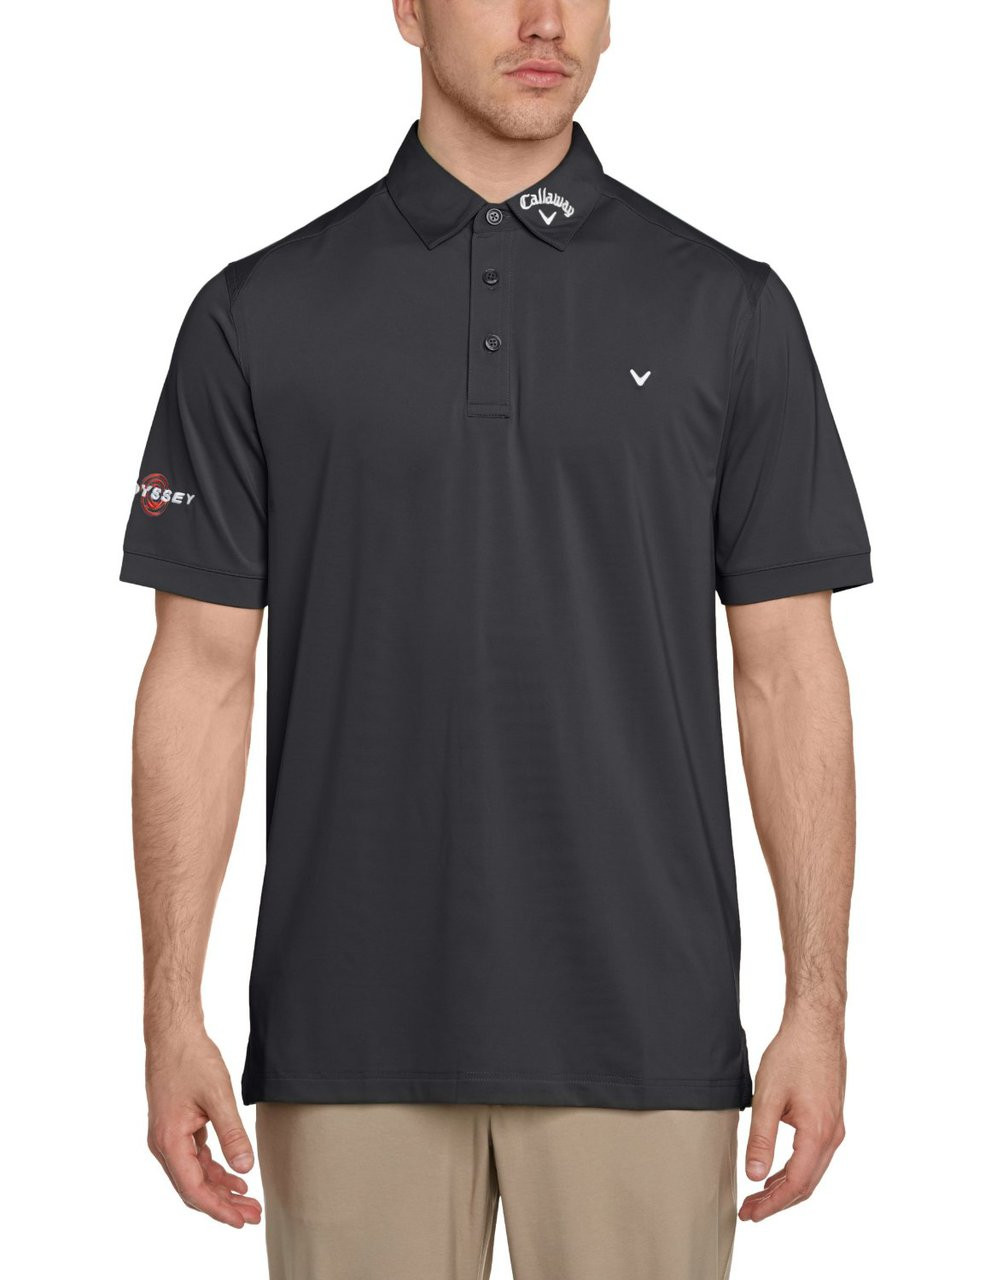 bfe9cf7b Callaway Mens Opti Vent Tour Golf Polo Shirt Caviar - London Pro Golf